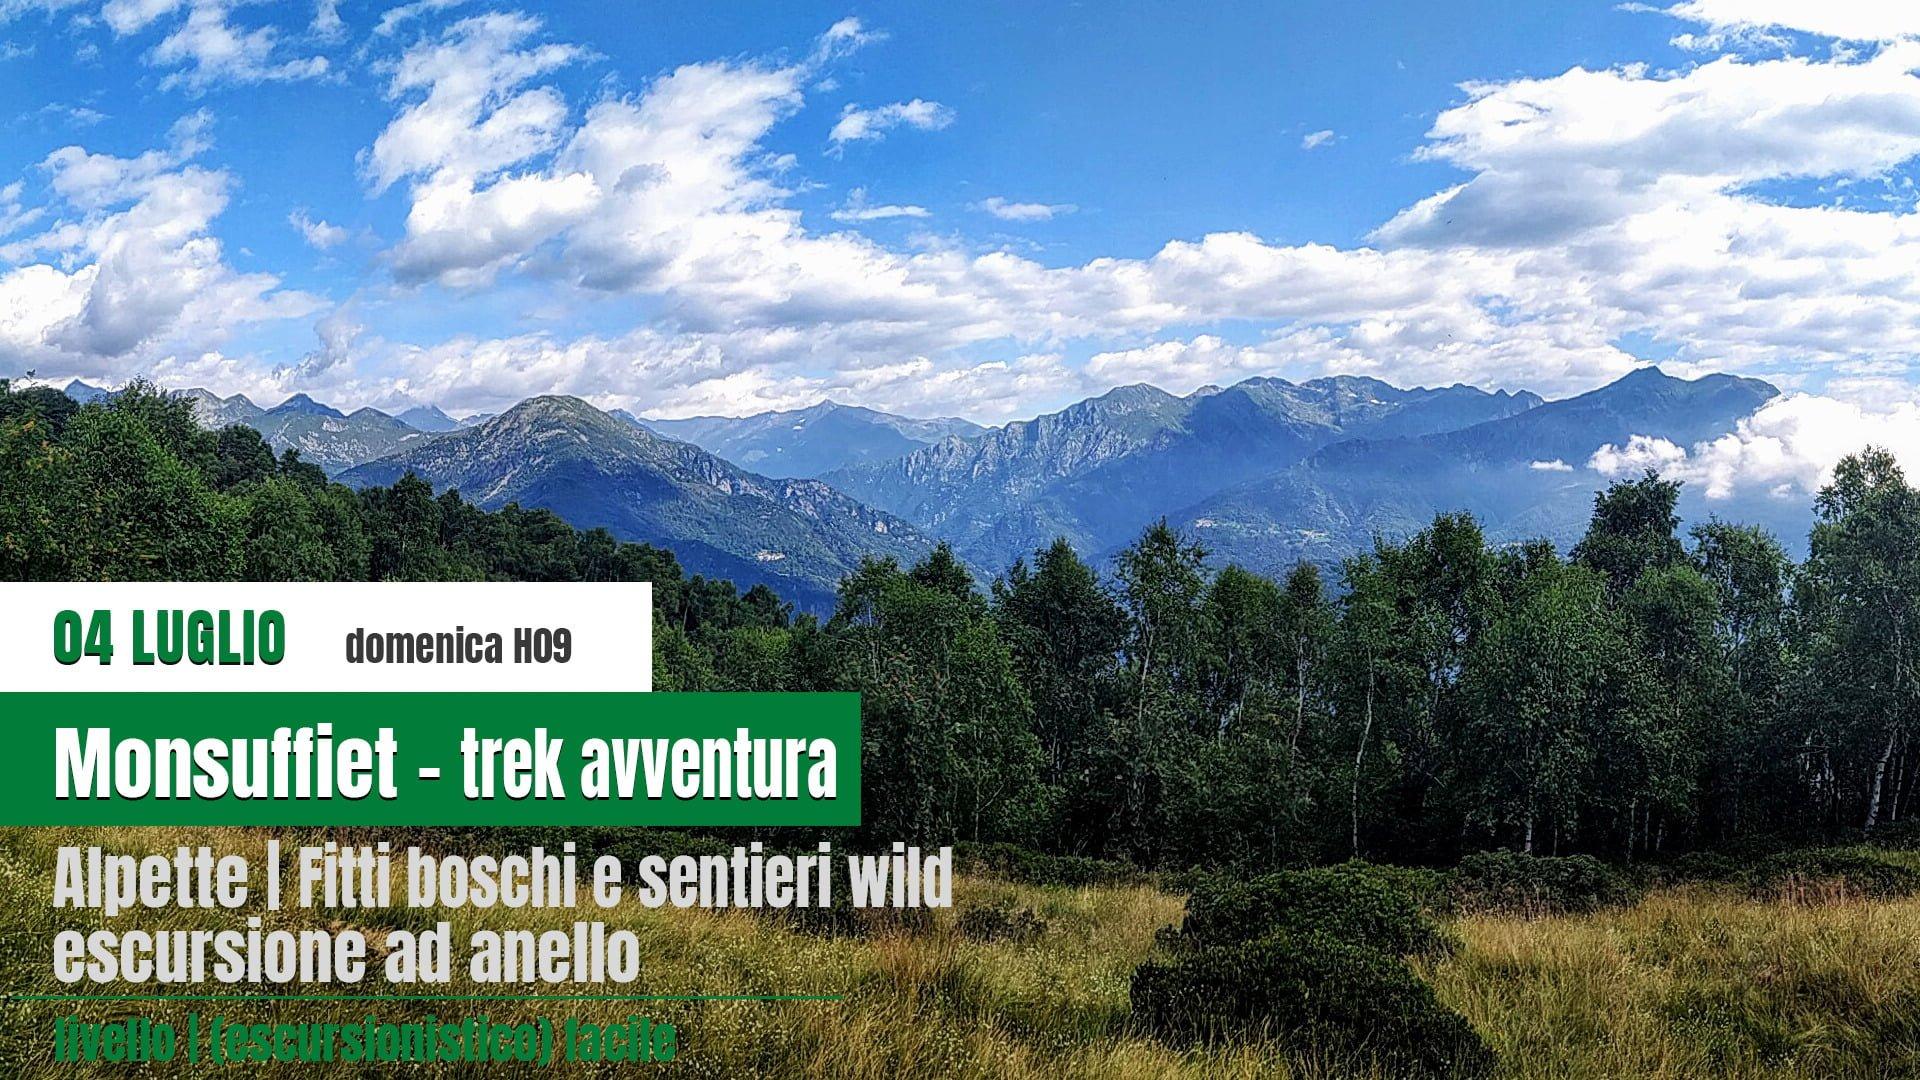 Monsuffiet wild trek